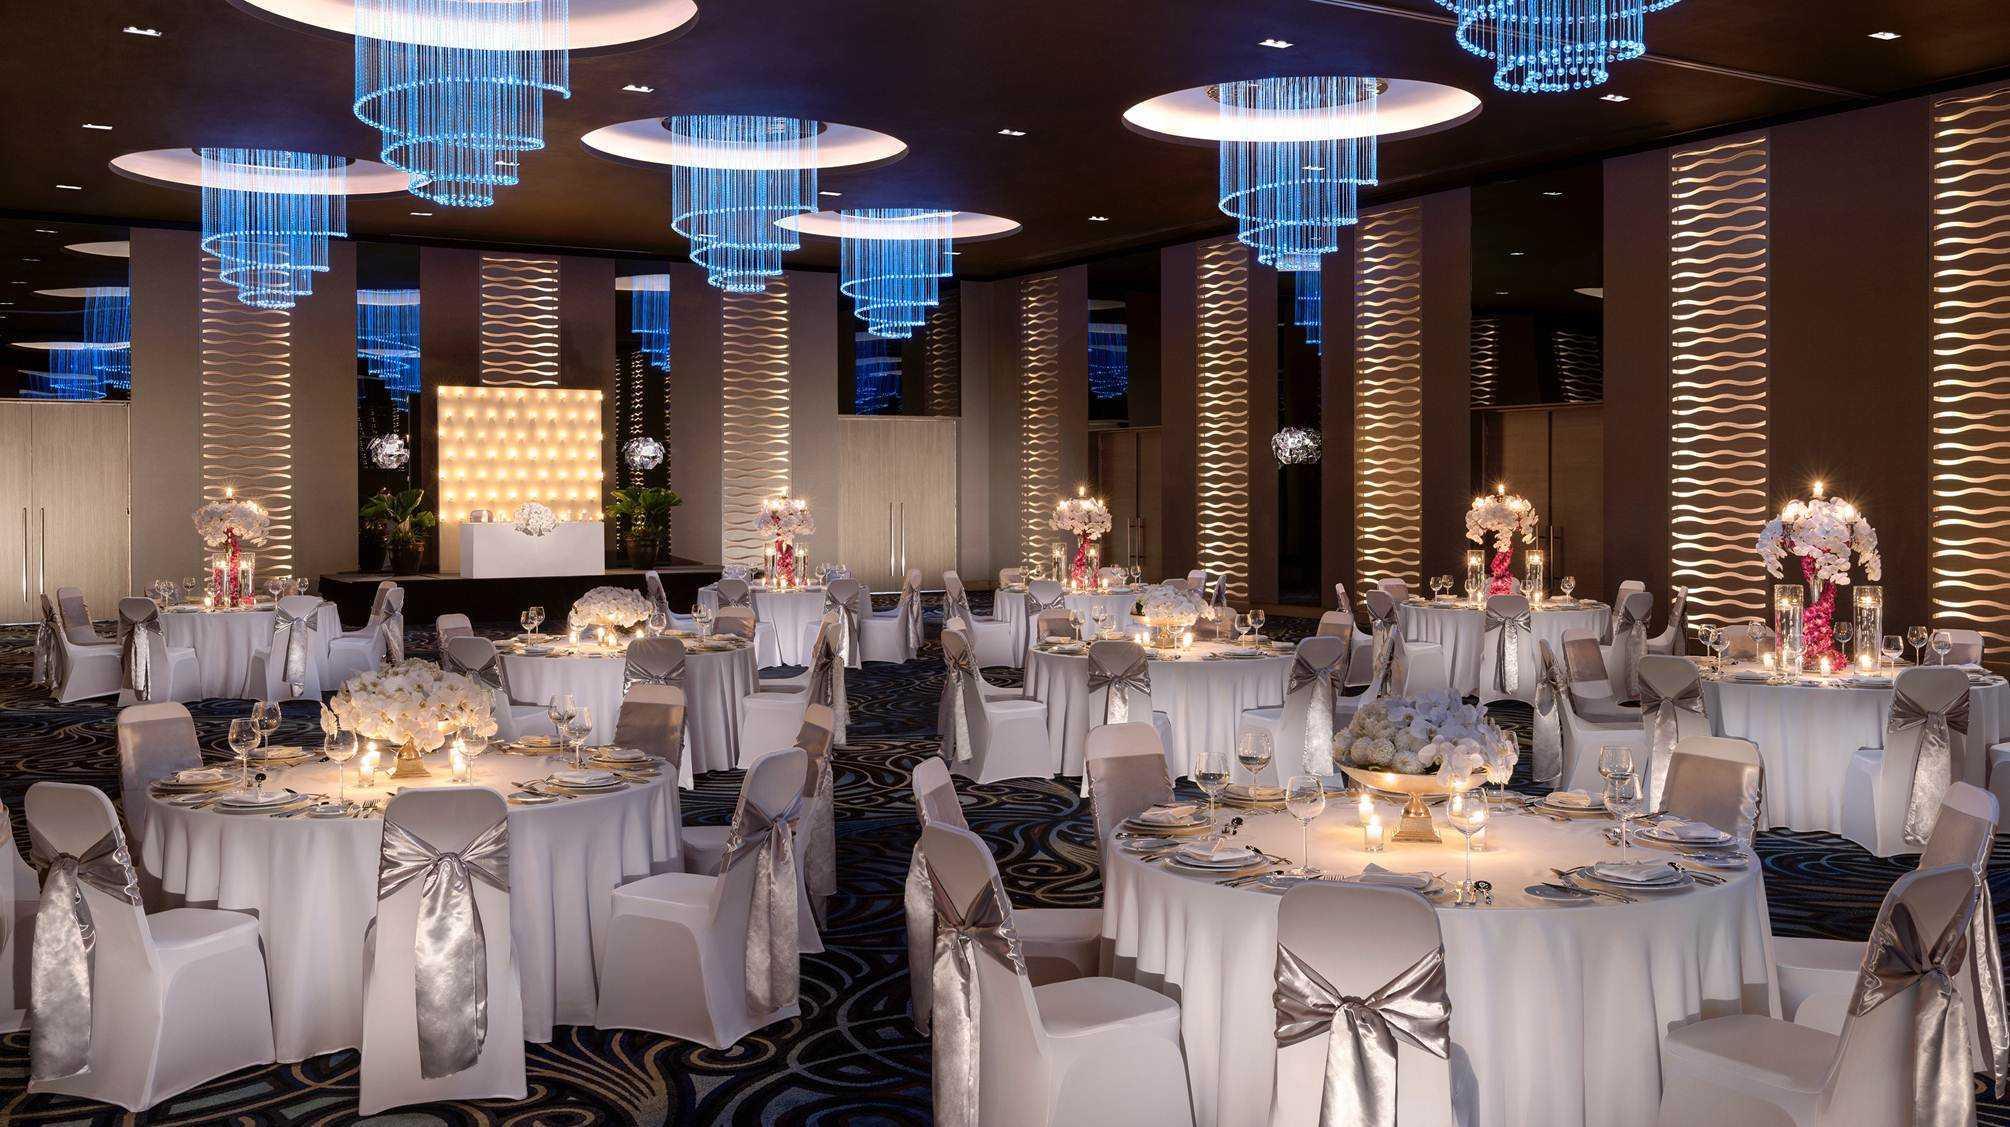 Wgc International Dusit Thani Hotel Guam Guam Picture4   34554